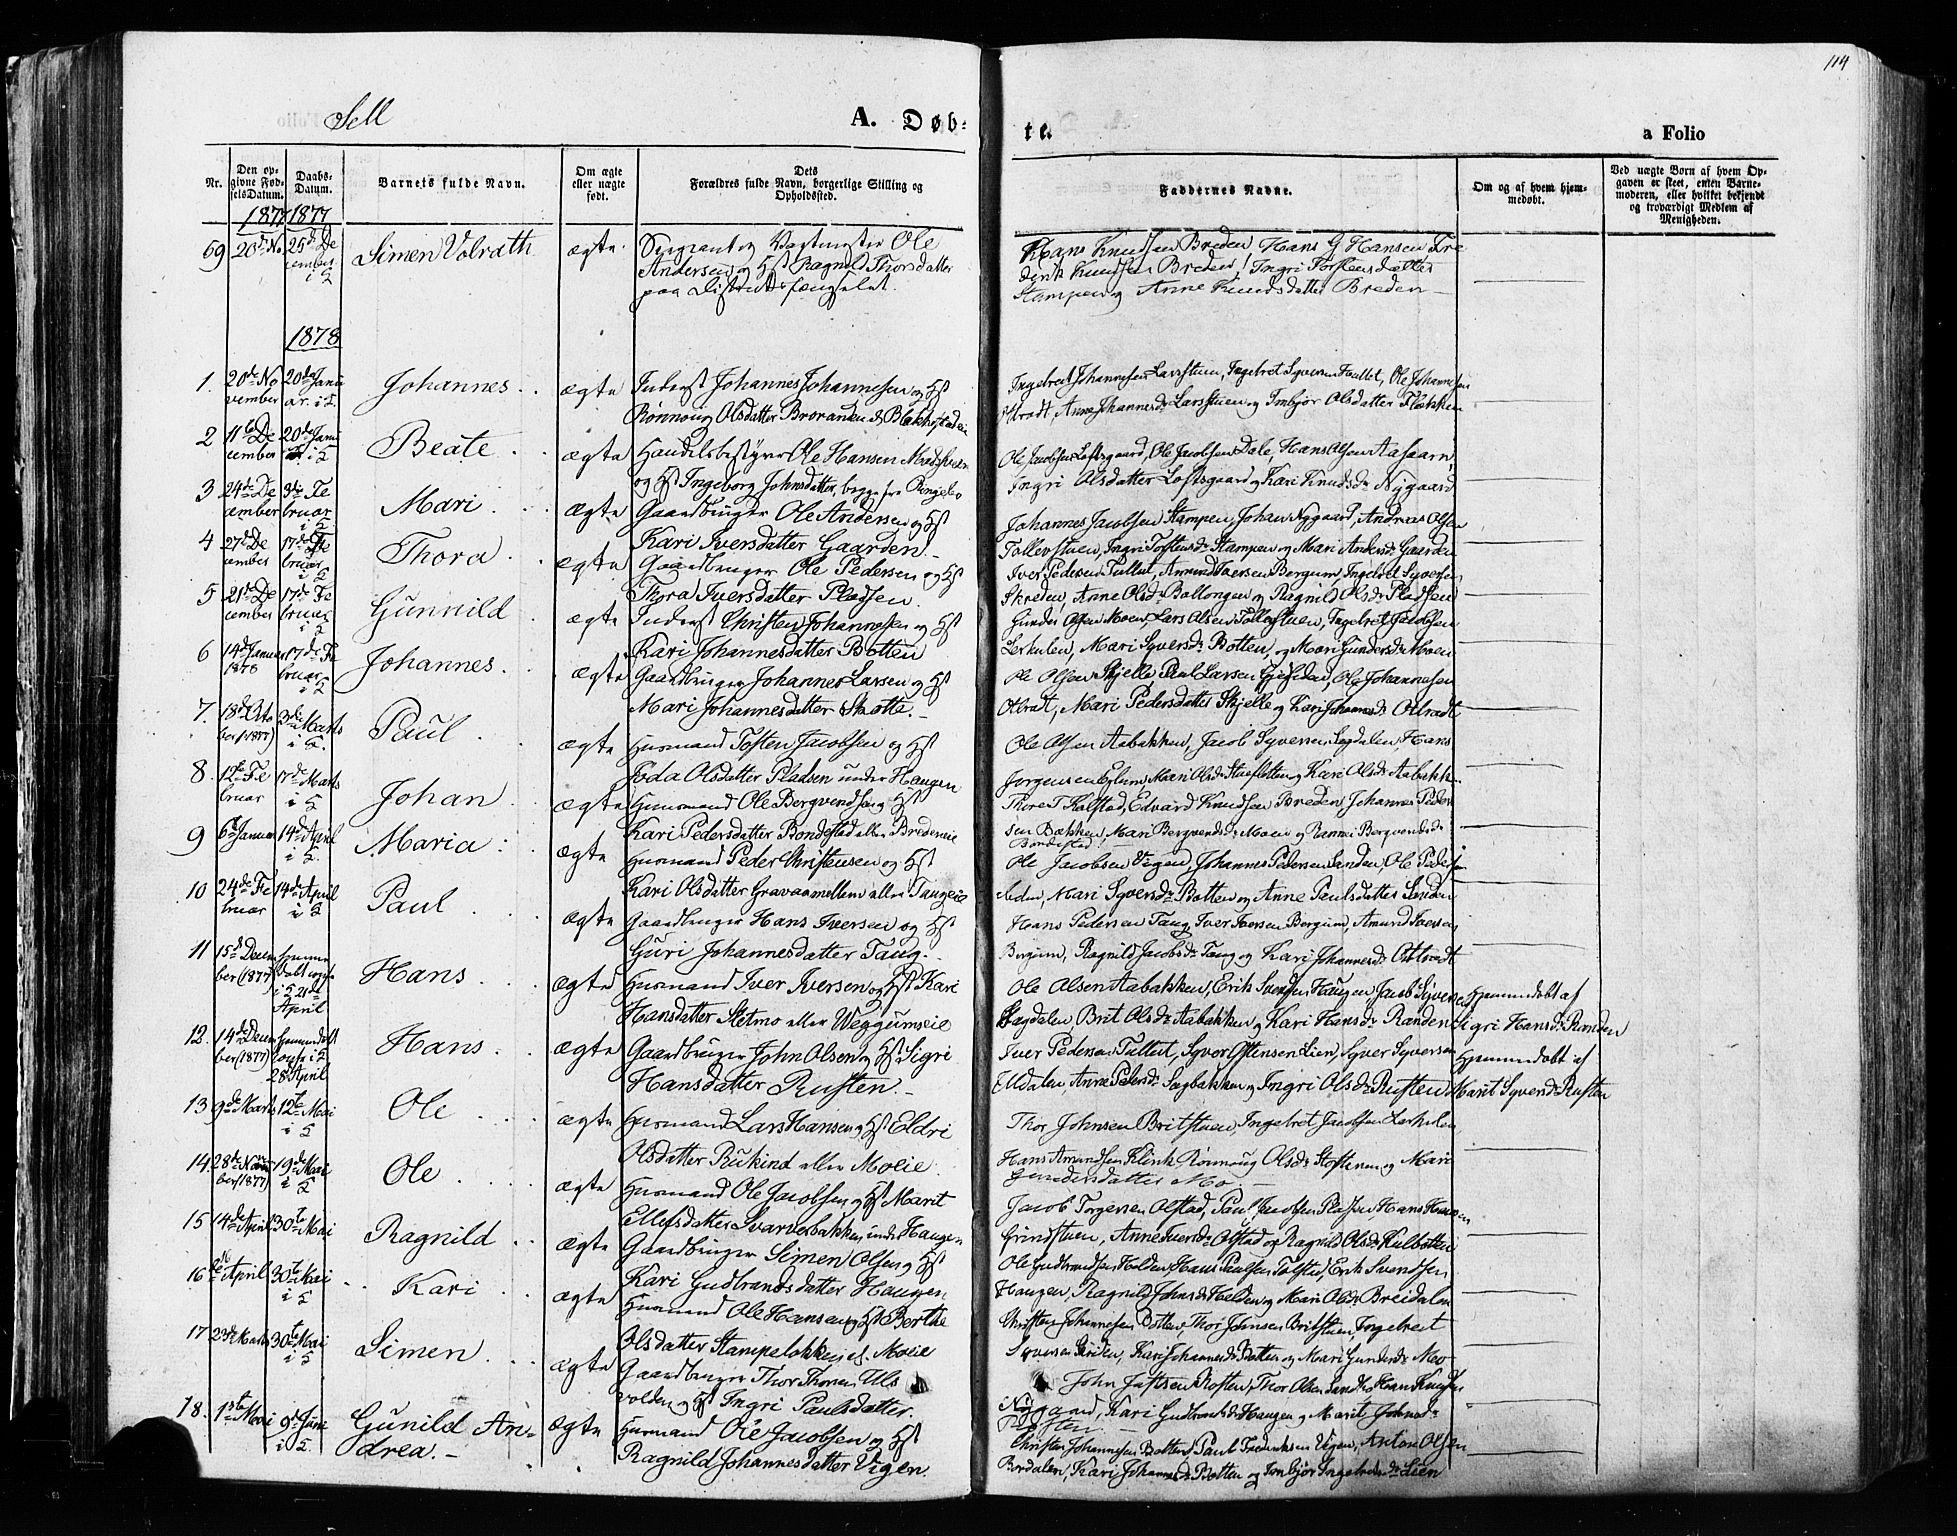 SAH, Vågå prestekontor, Ministerialbok nr. 7 /3, 1872-1886, s. 114